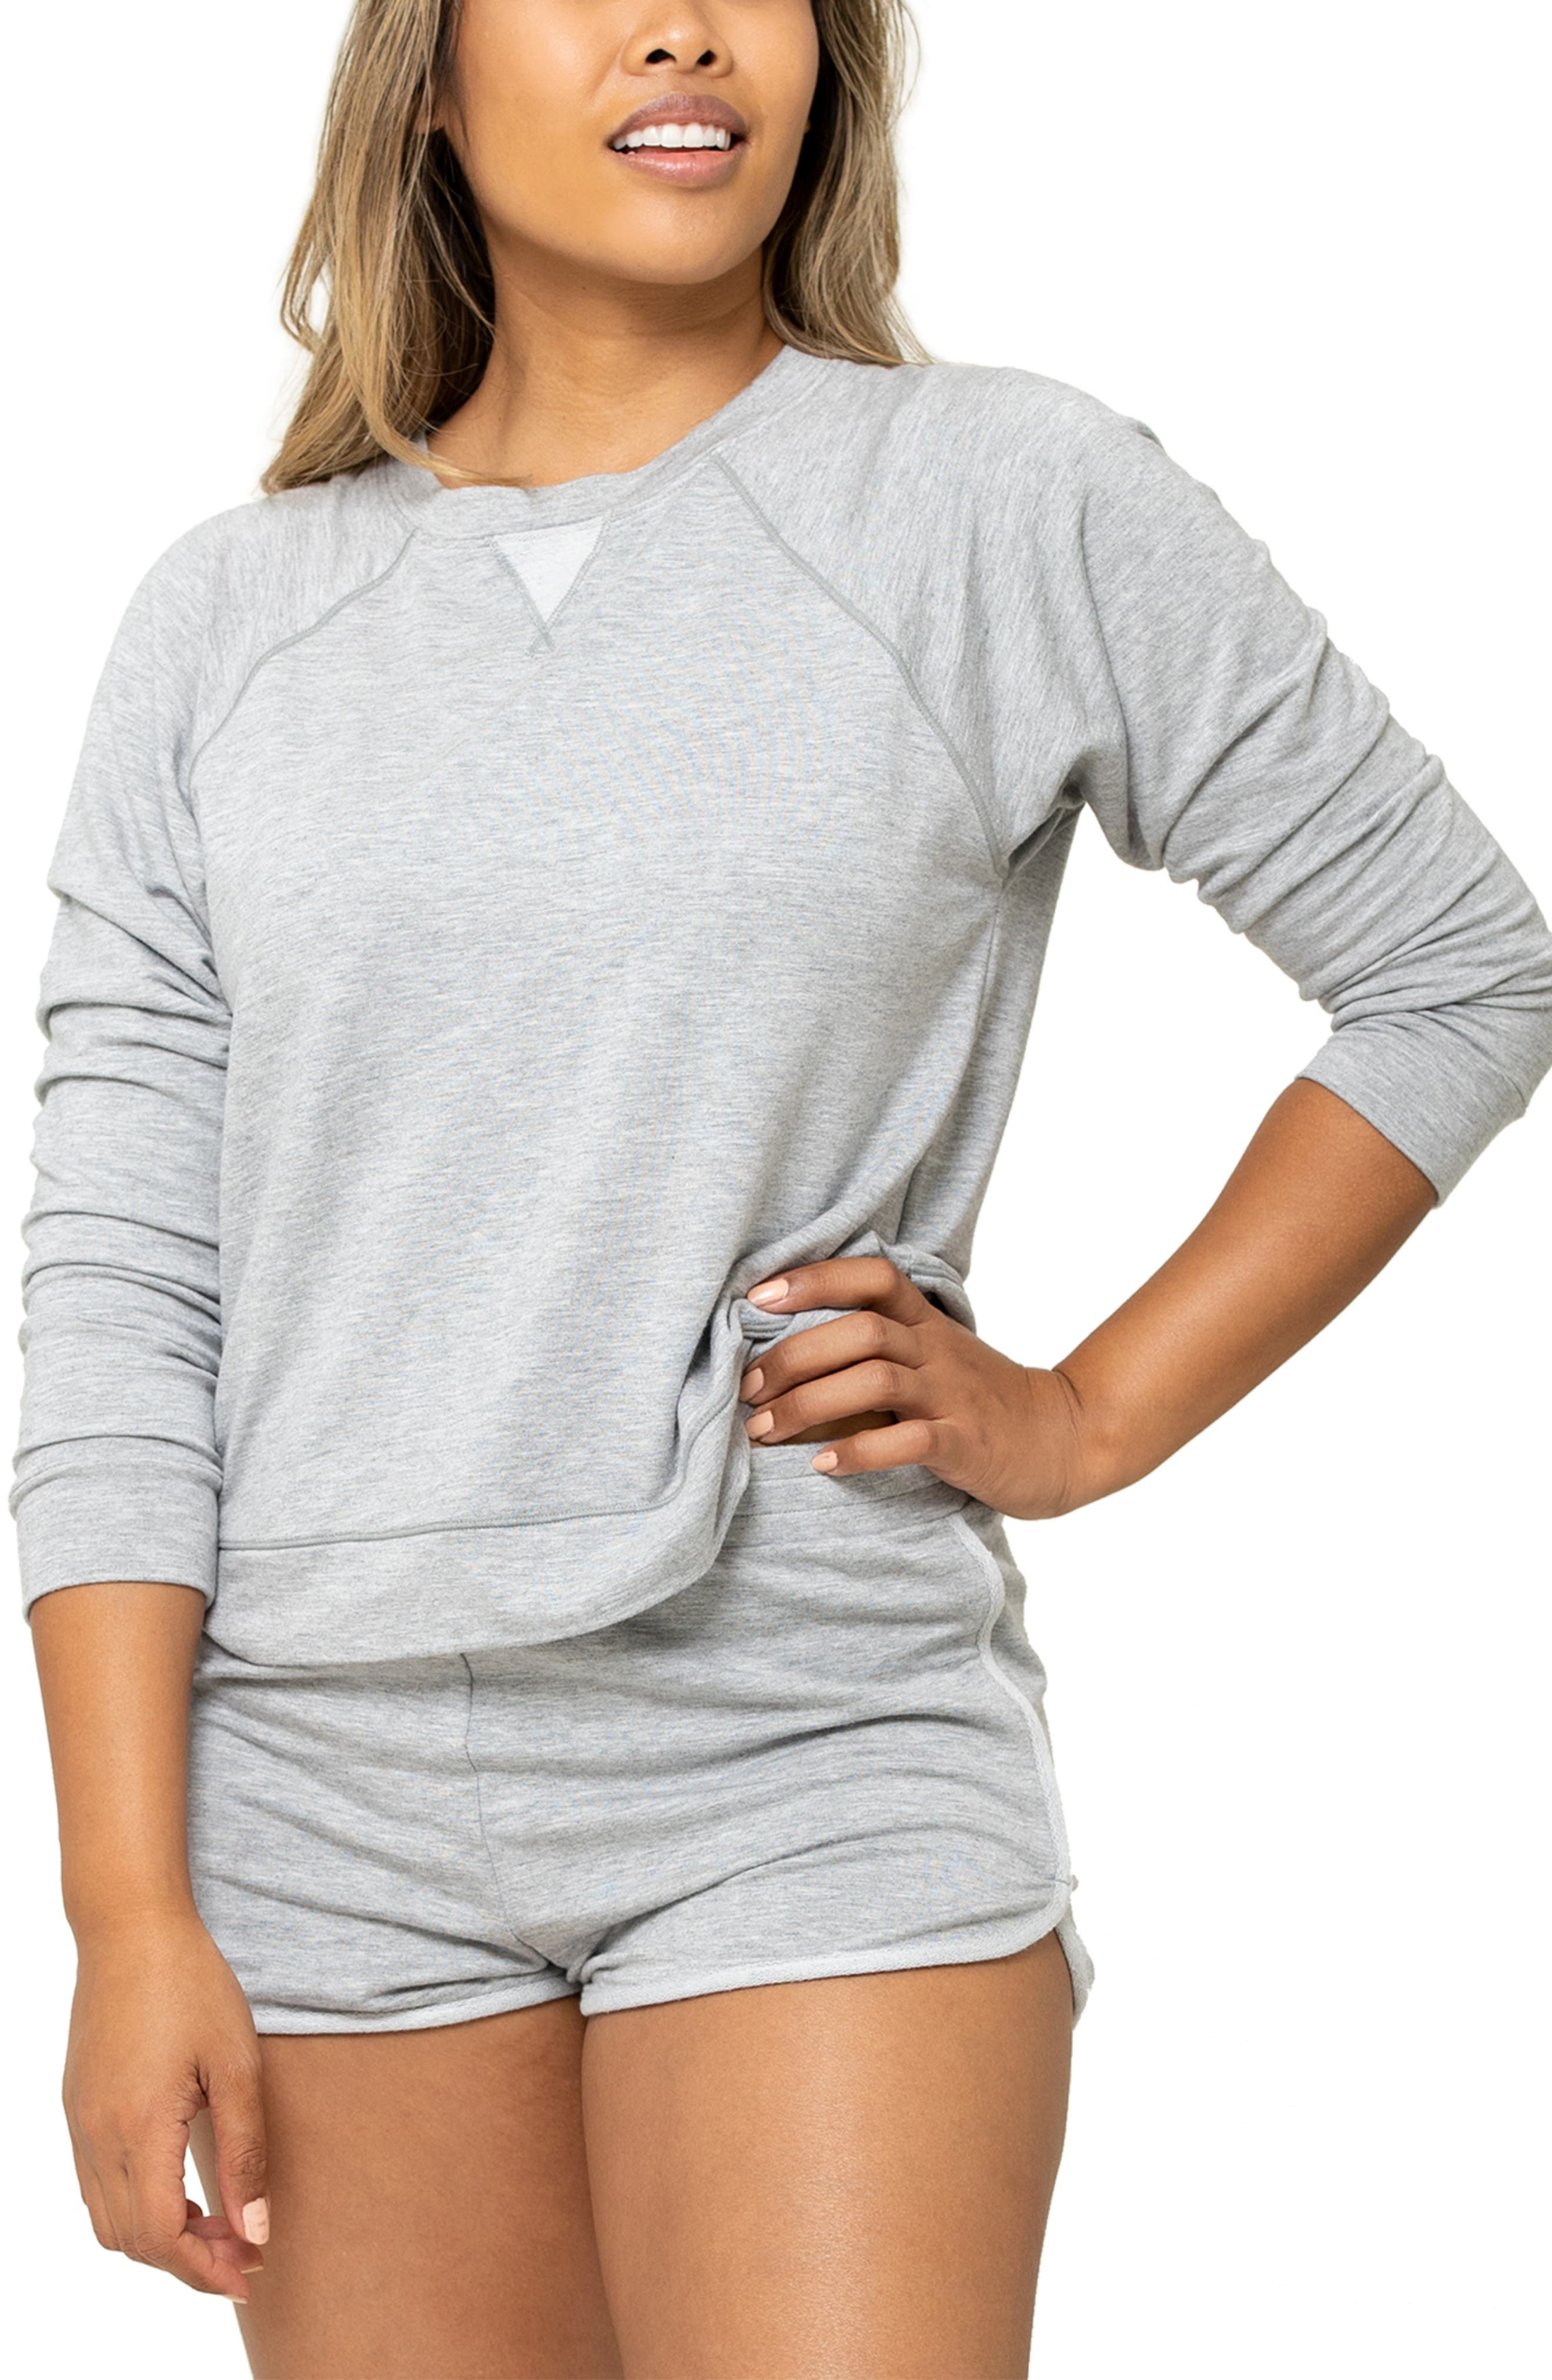 The Terry Crew Sweatshirt